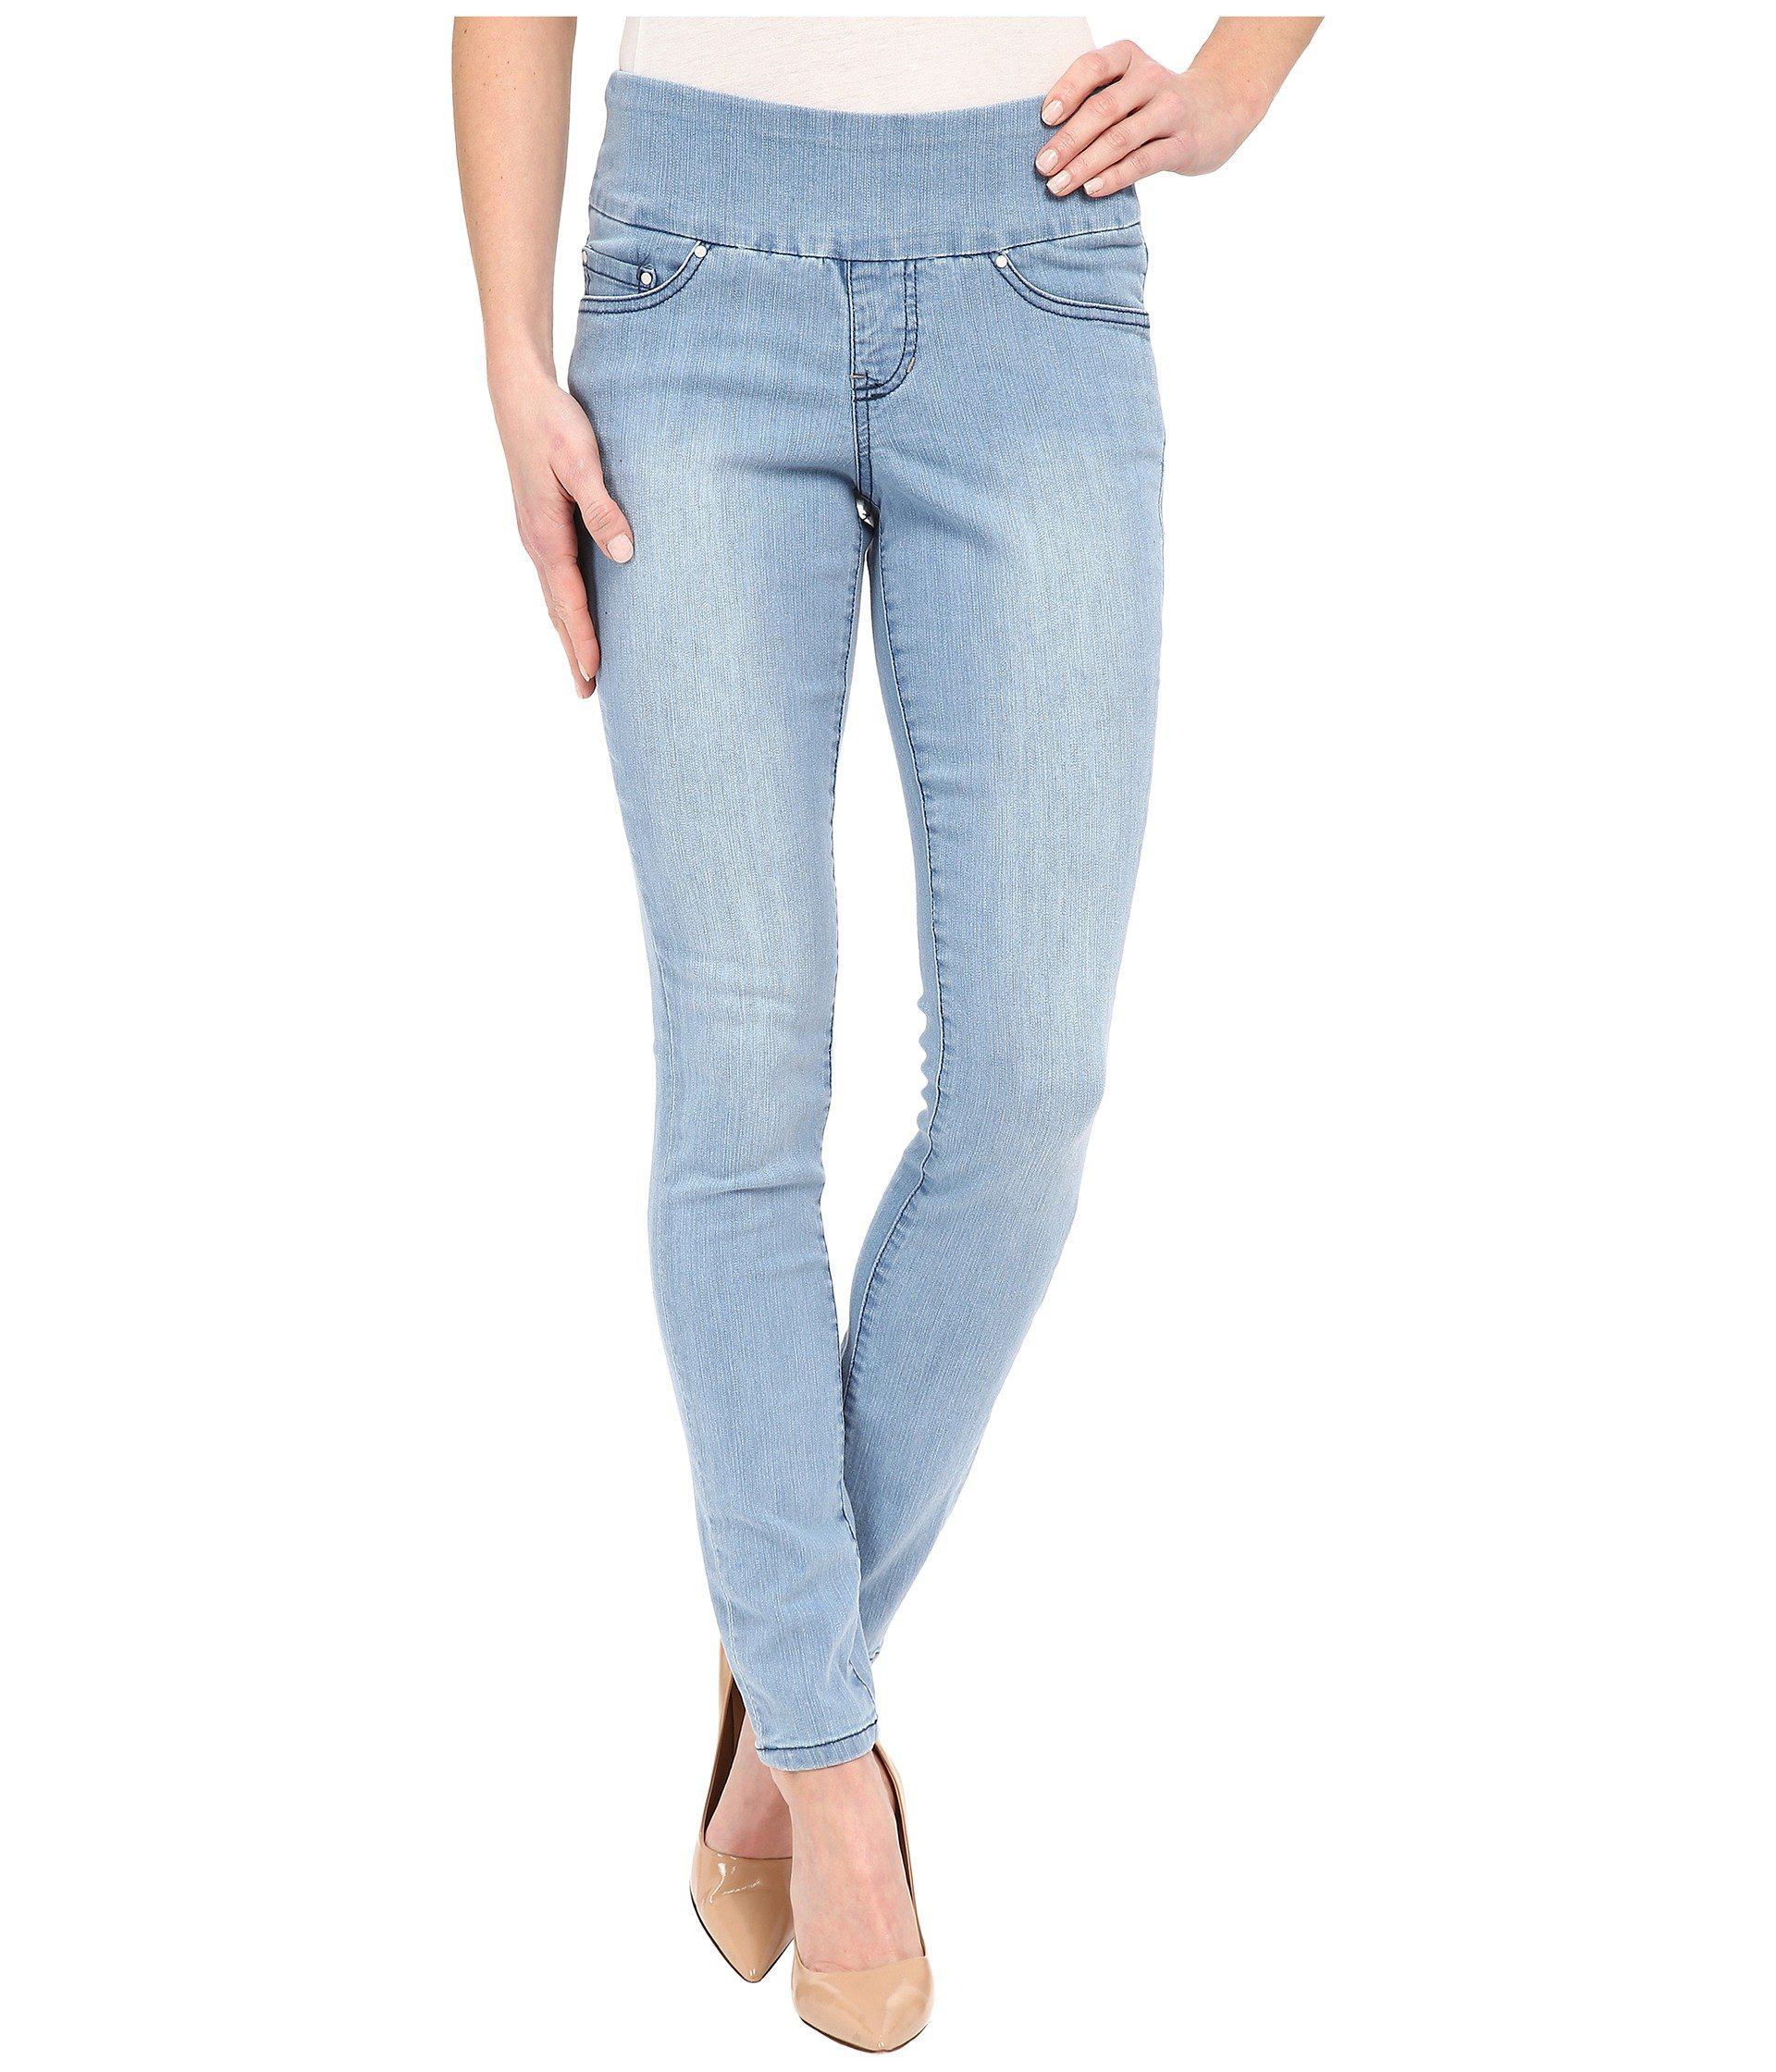 jeans short denim jewelry waist clothing authentics shoes comfort product men mens wrangler stonewash comforter vintage s tibs